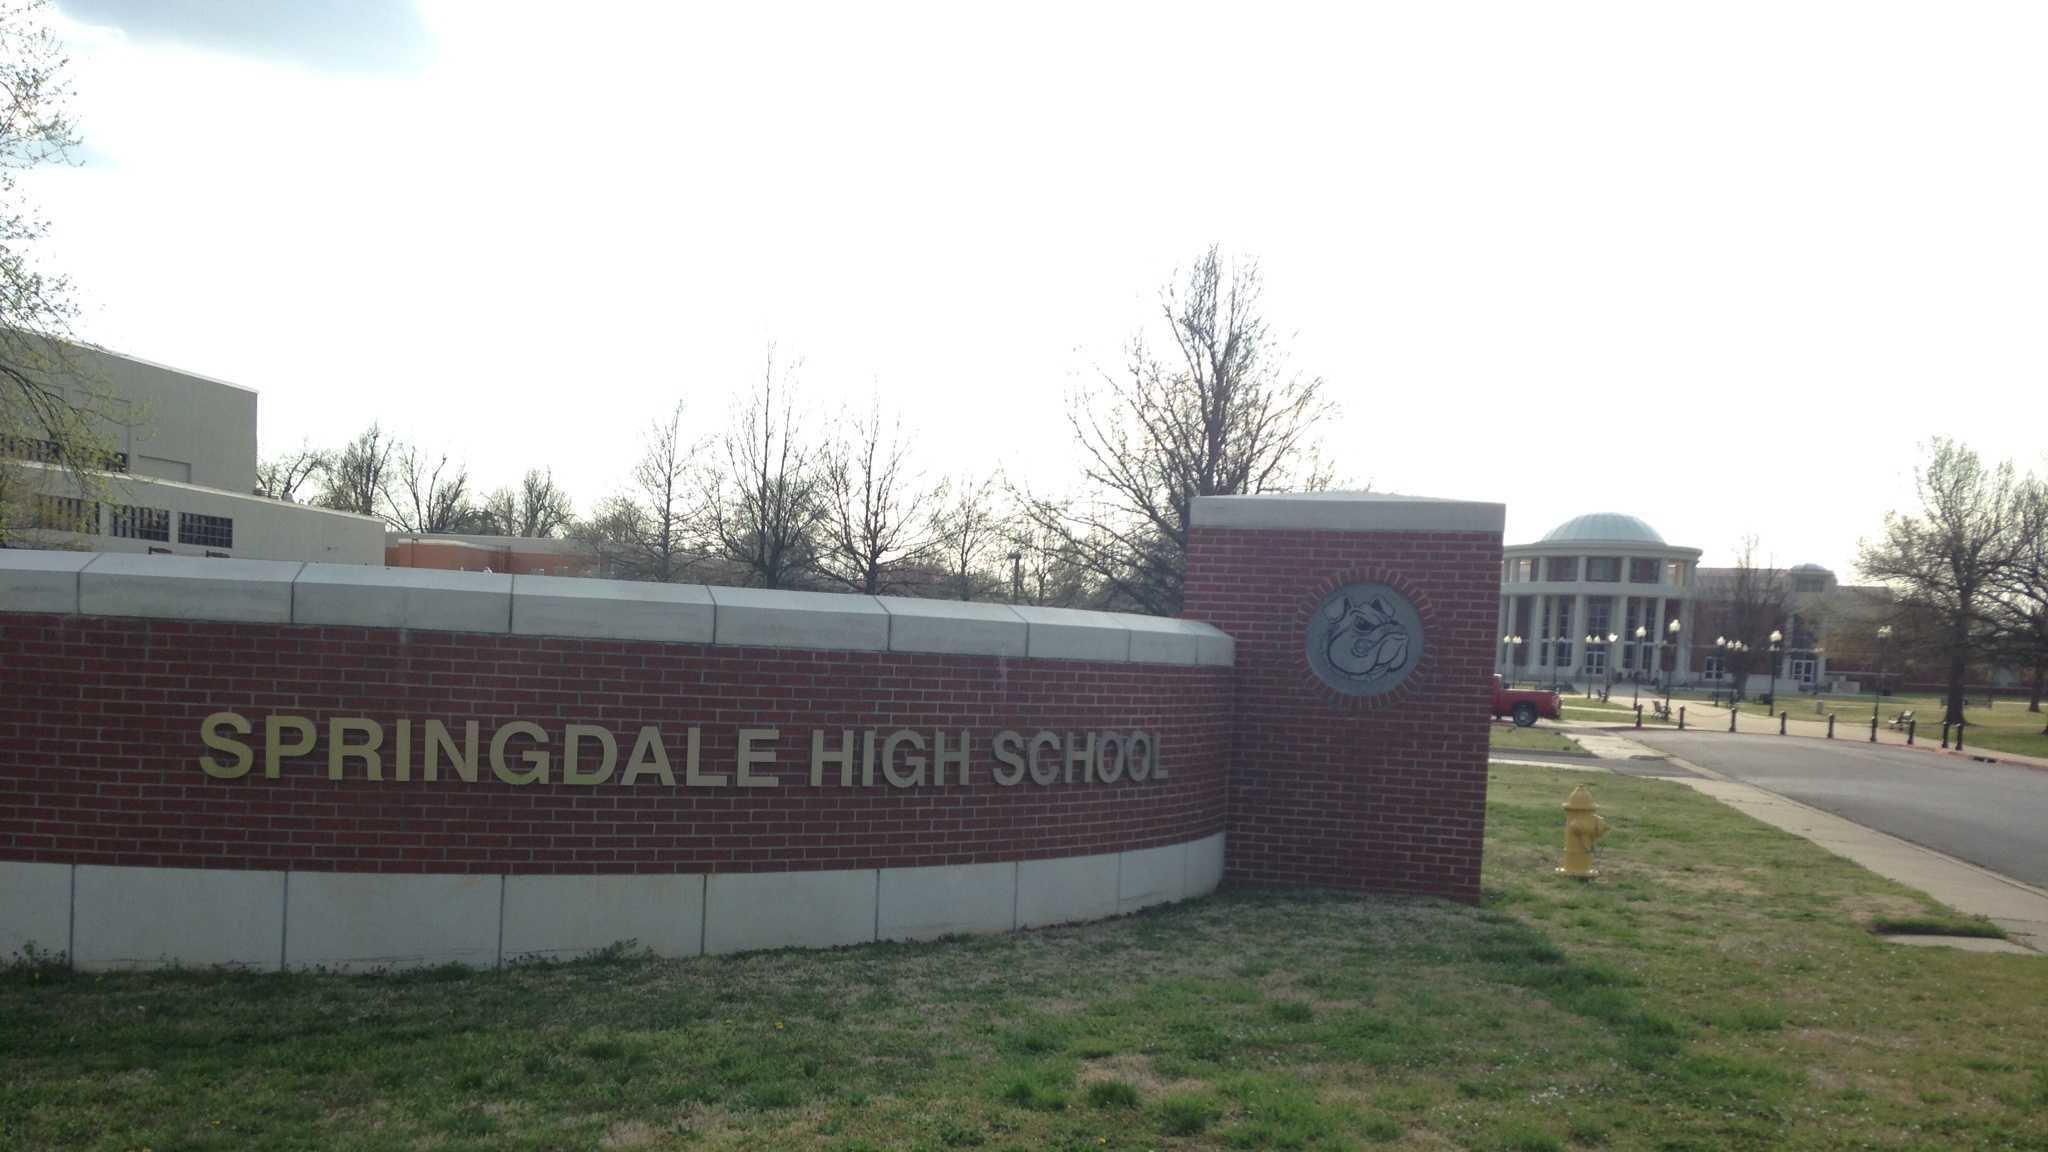 Police investigate bomb threat at Springdale High